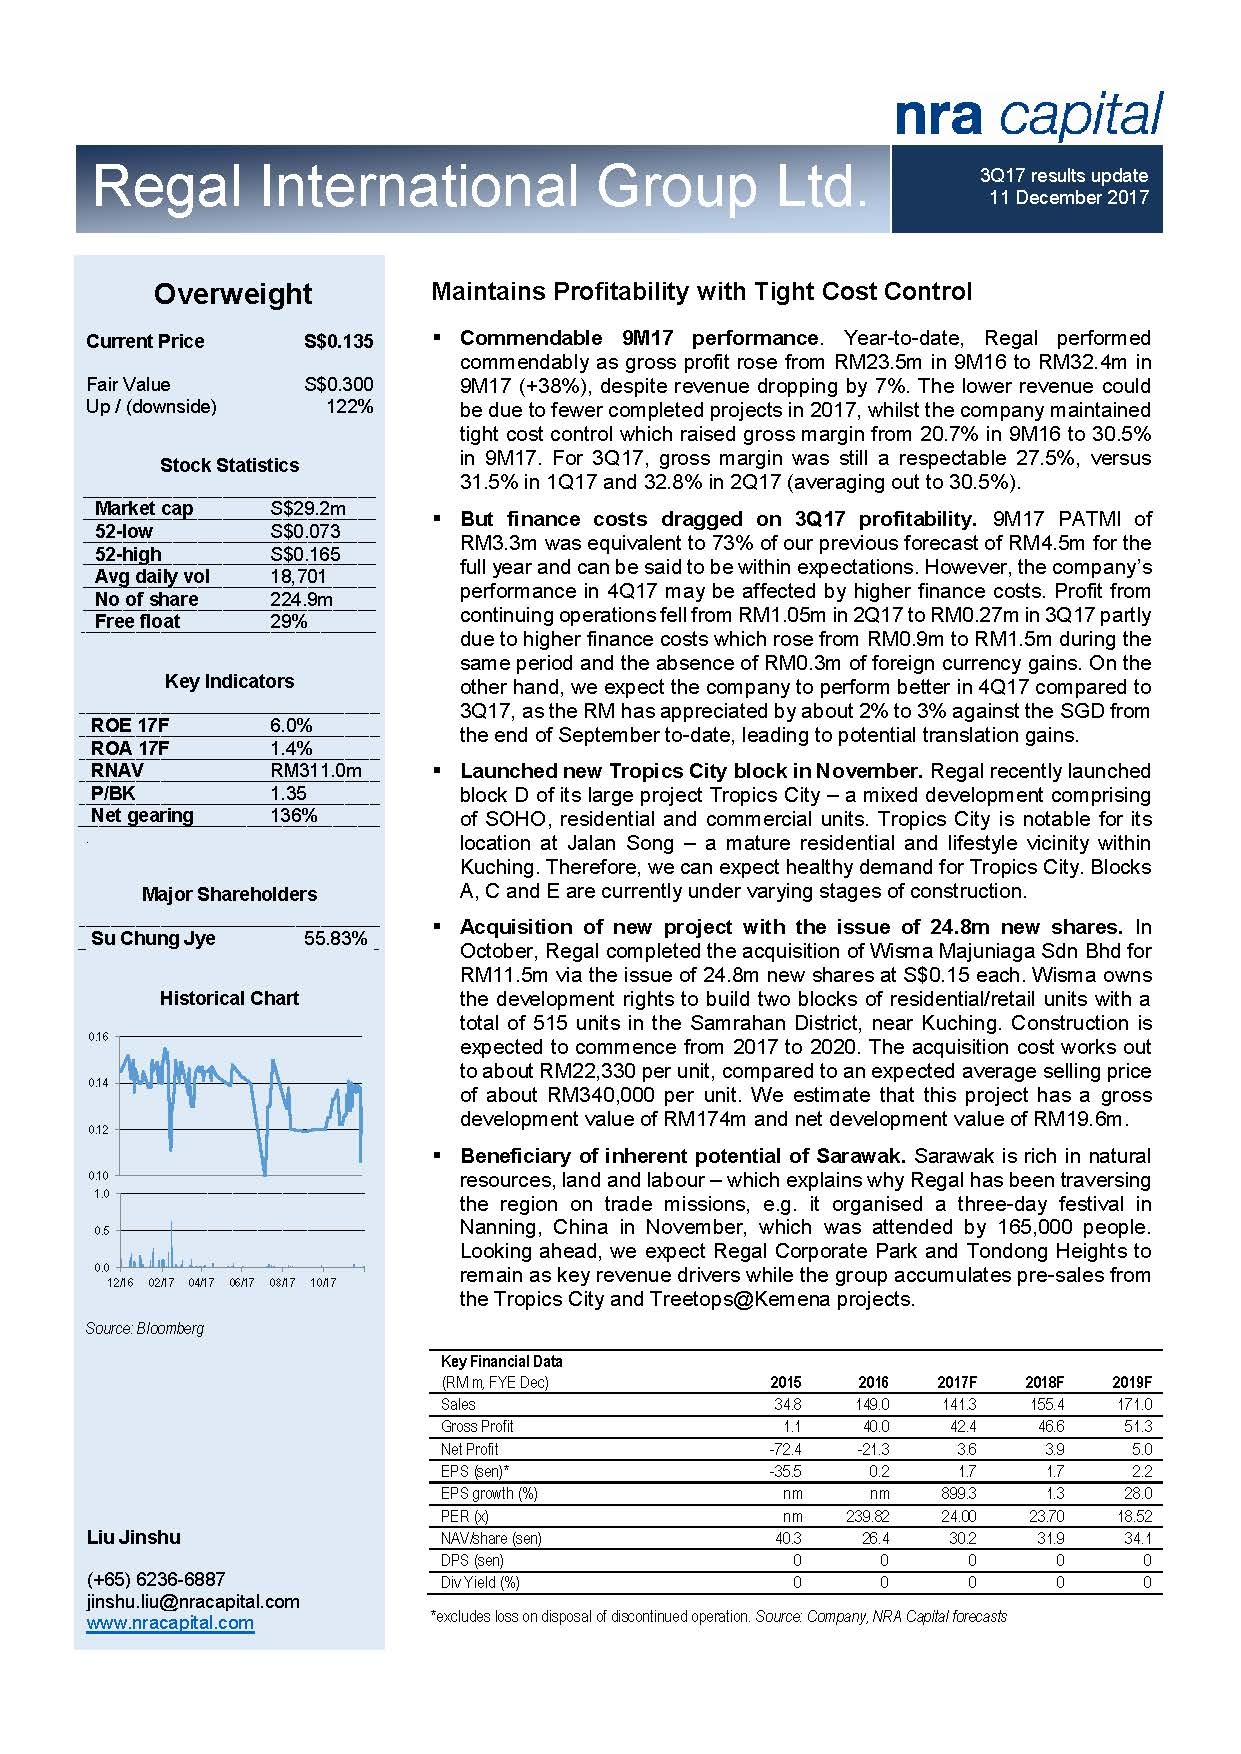 Research Report 11 Dec 2017